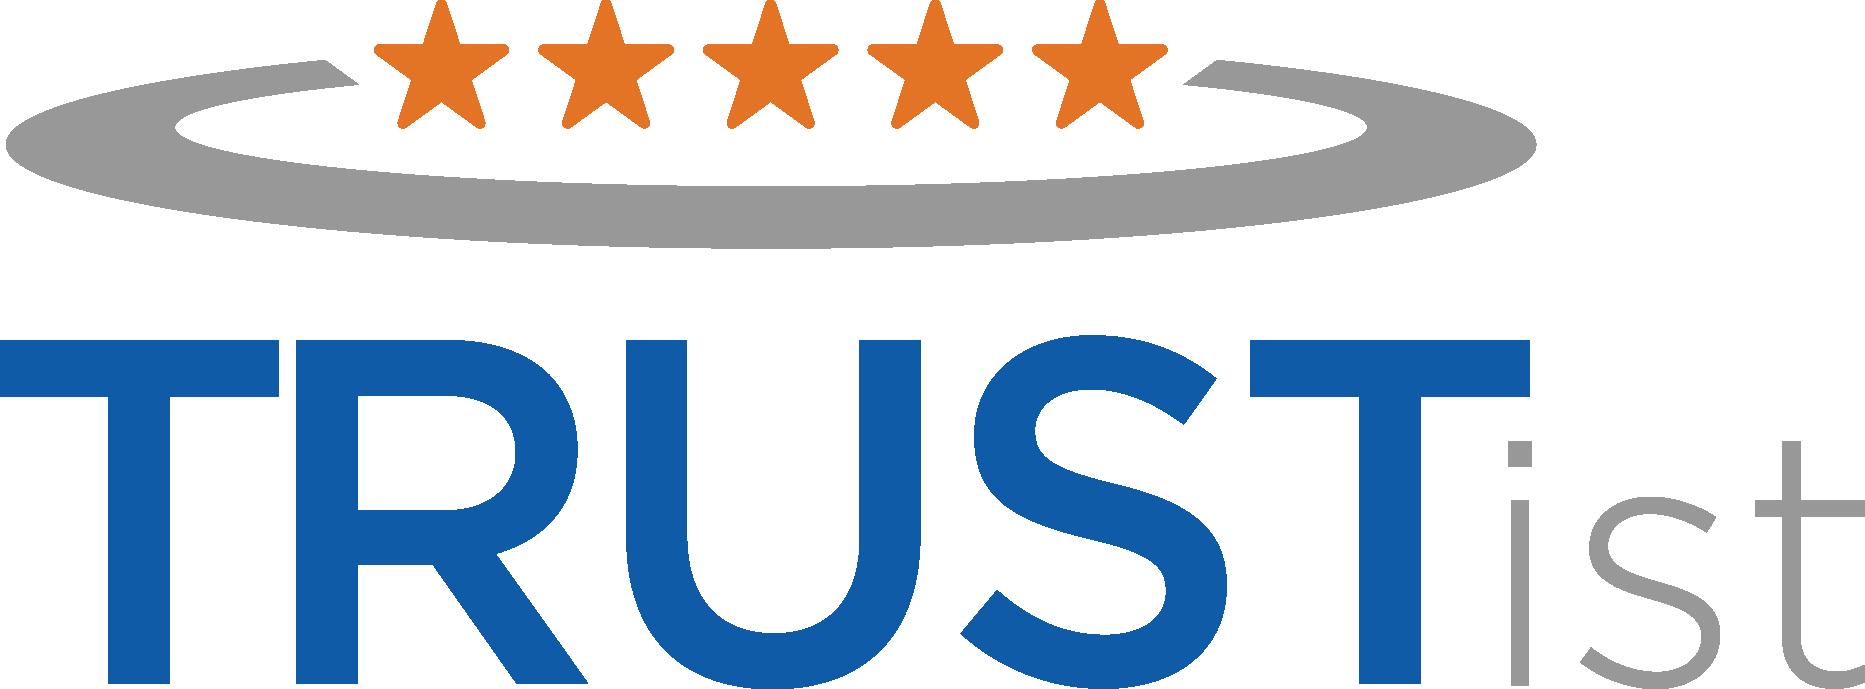 5-star-ciustomer-reviews-building-services-northwestlondon